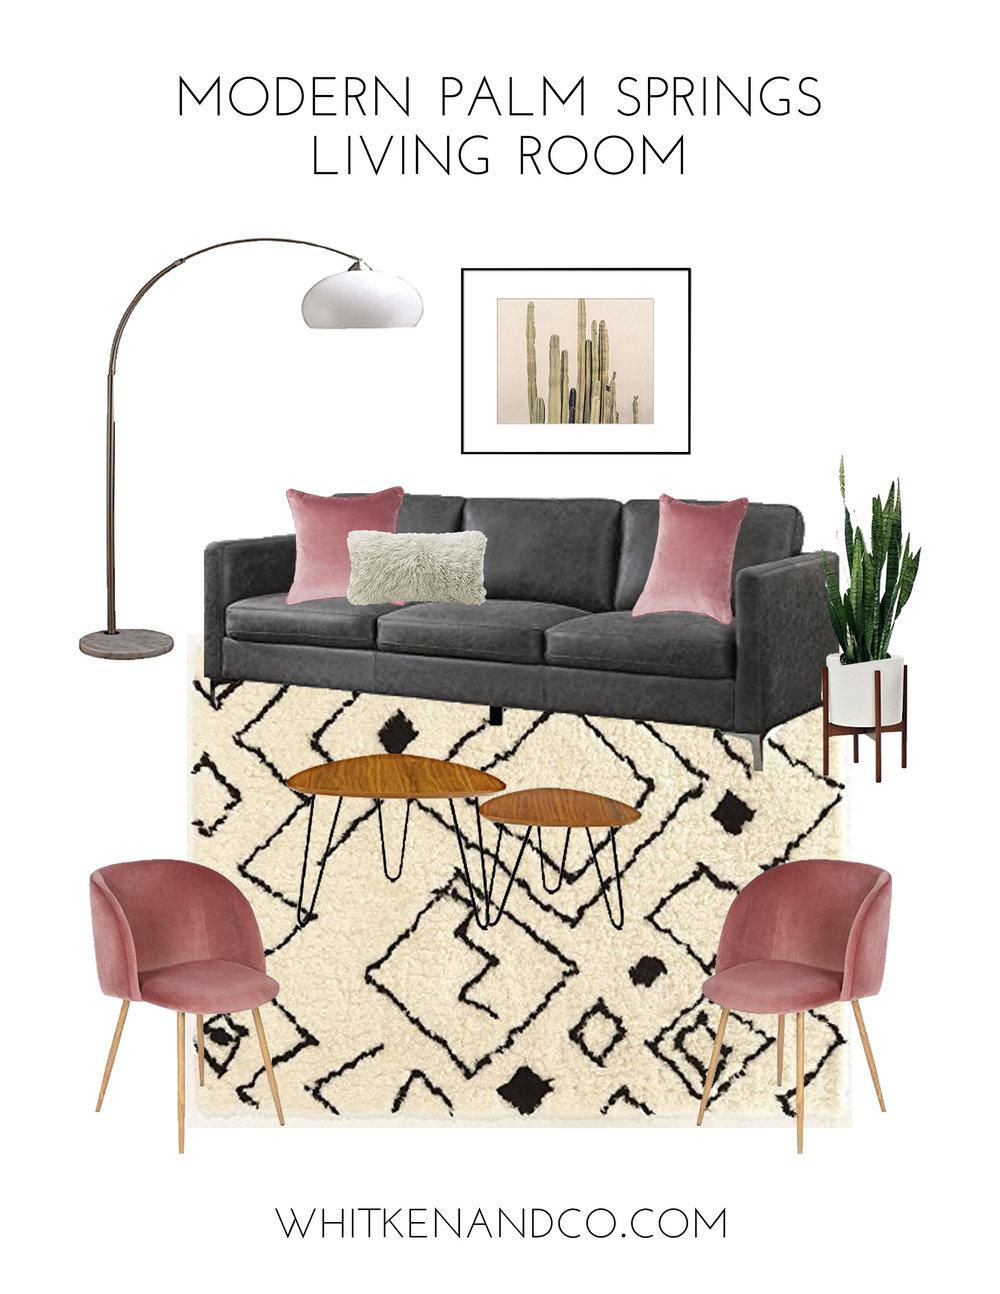 Modern Palm Springs Living Room Mood Board